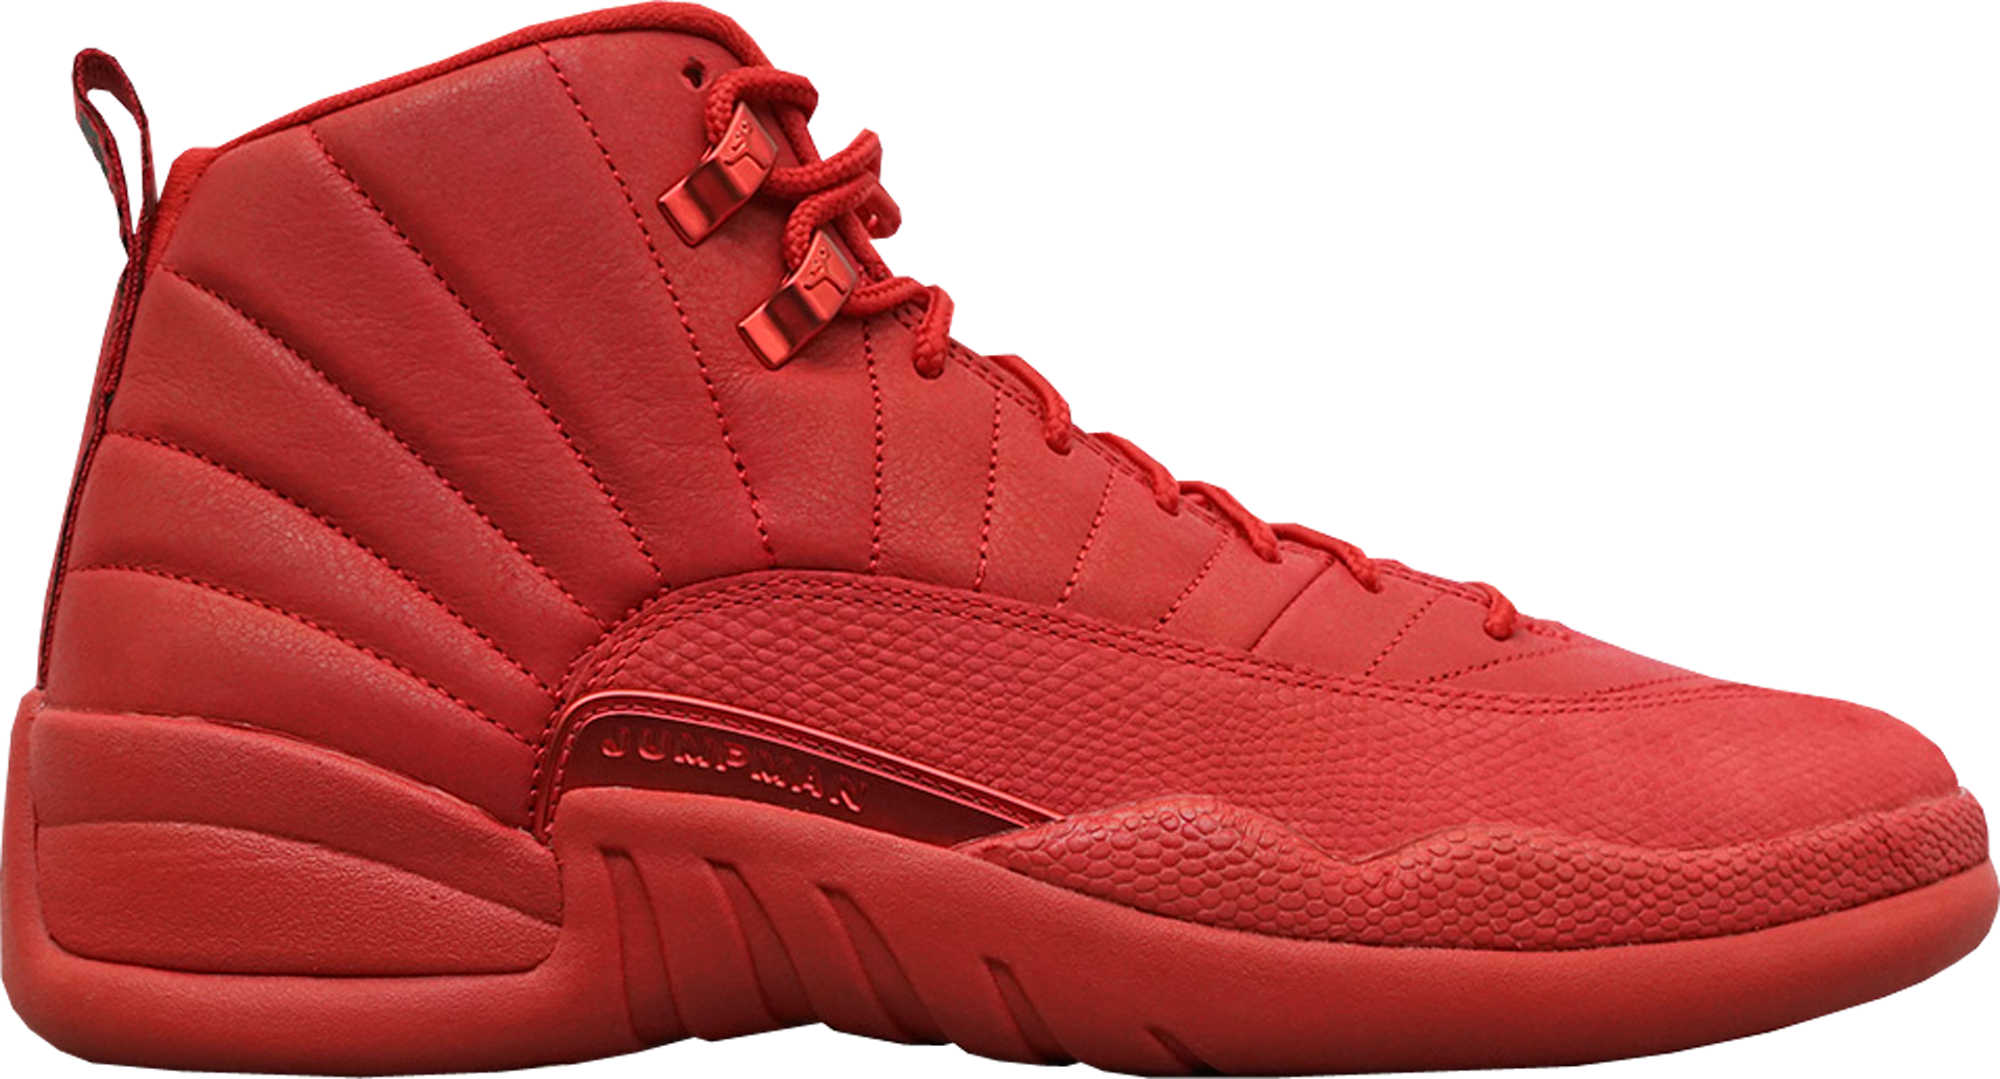 Jordan 12 Retro Gym Red (2018)